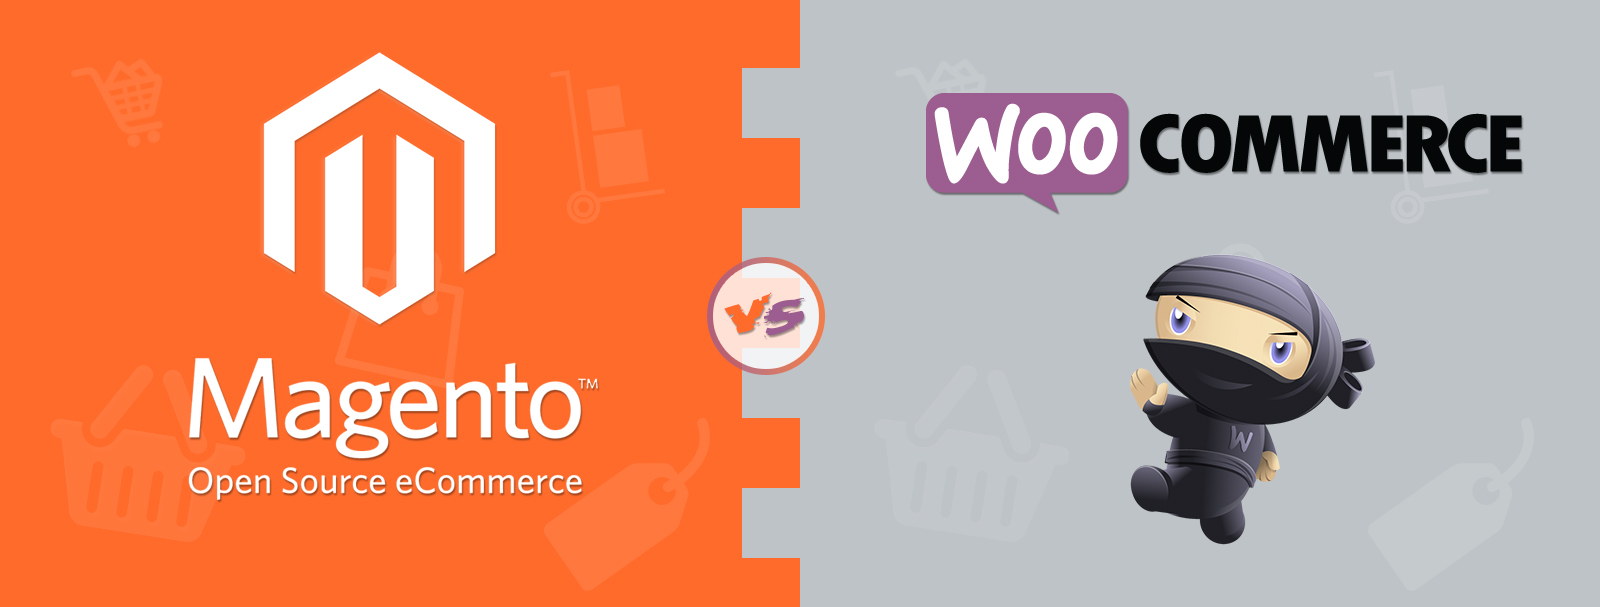 Woo Commerce sau Magento?